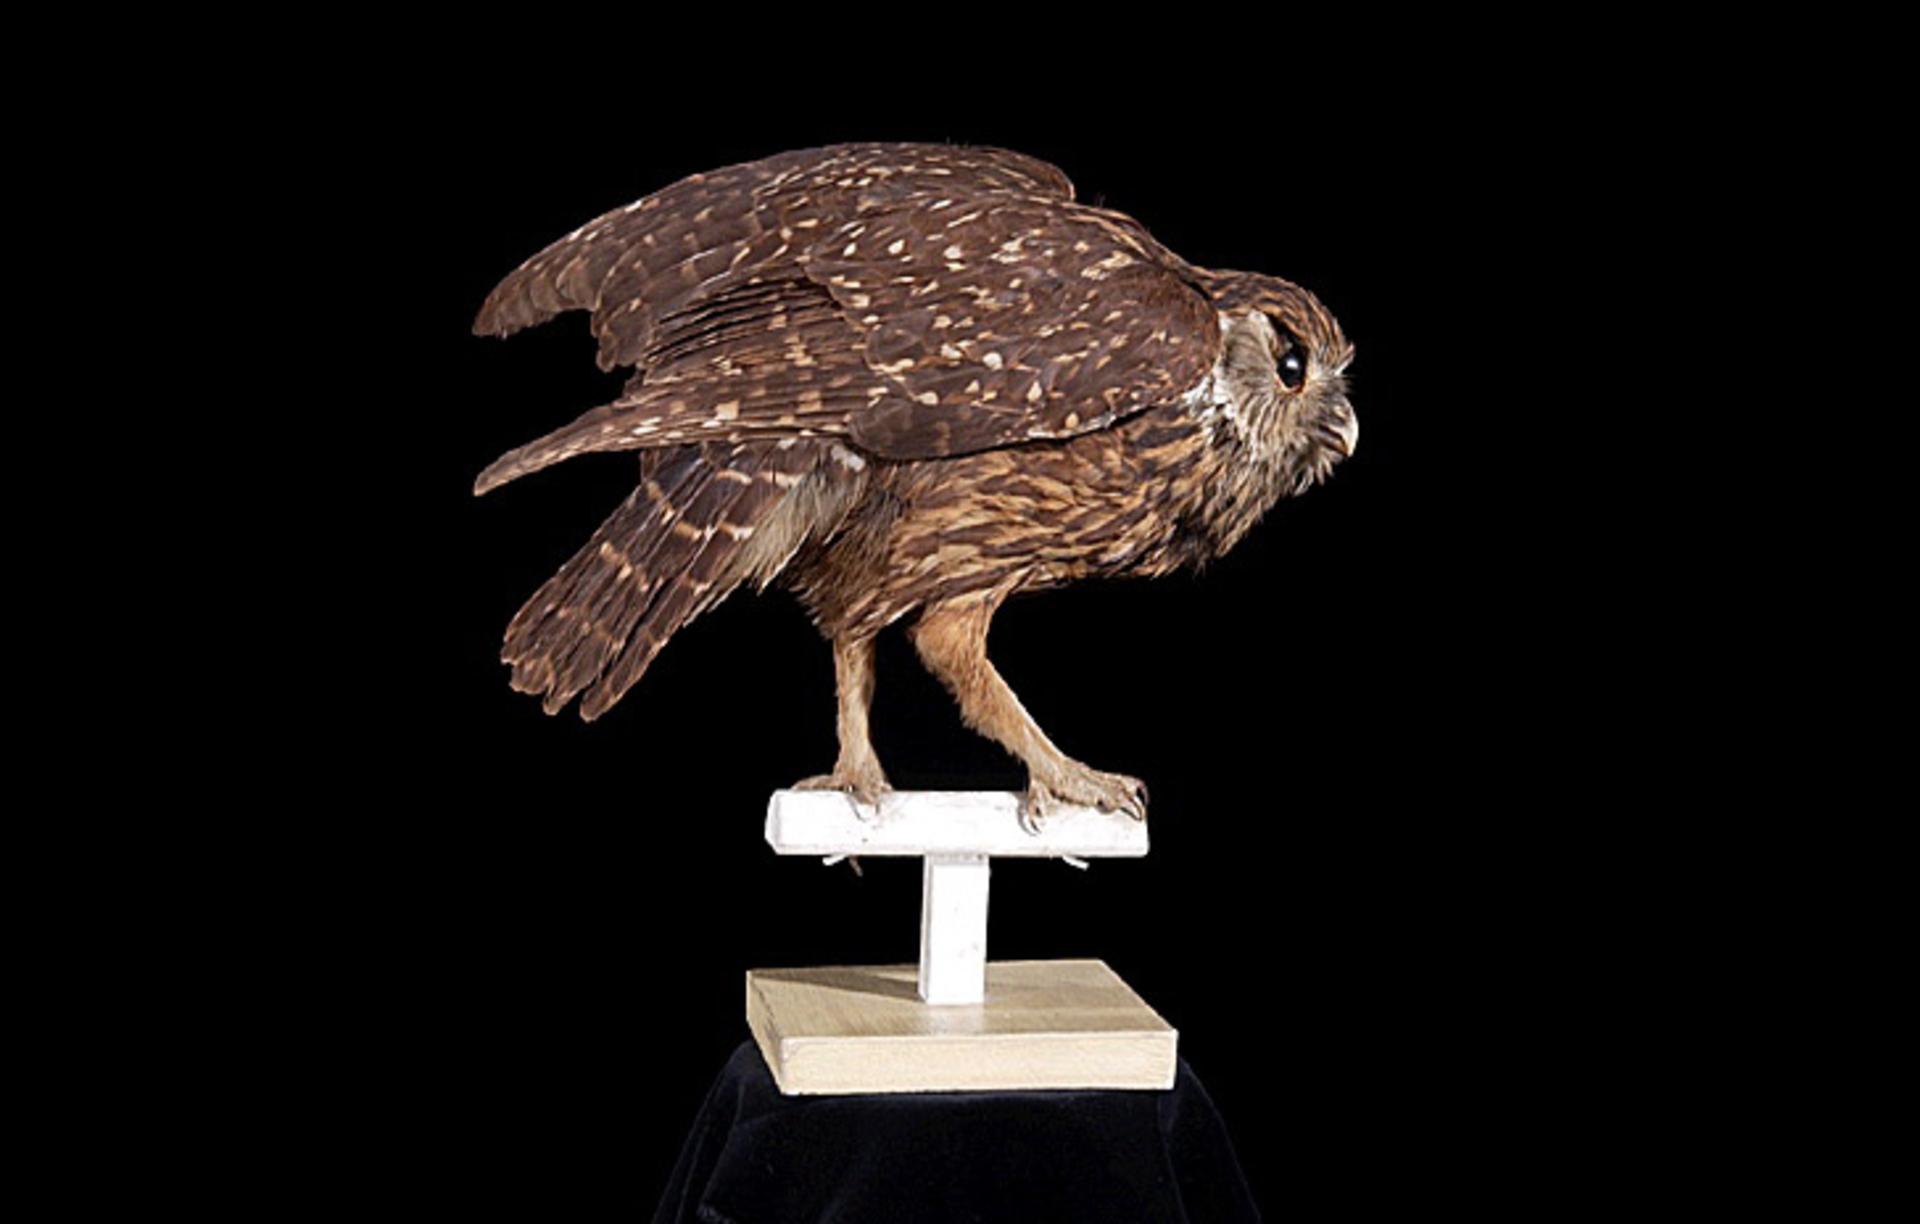 RMNH.AVES.110070 | Sceloglaux albifacies albifacies Gray, 1844